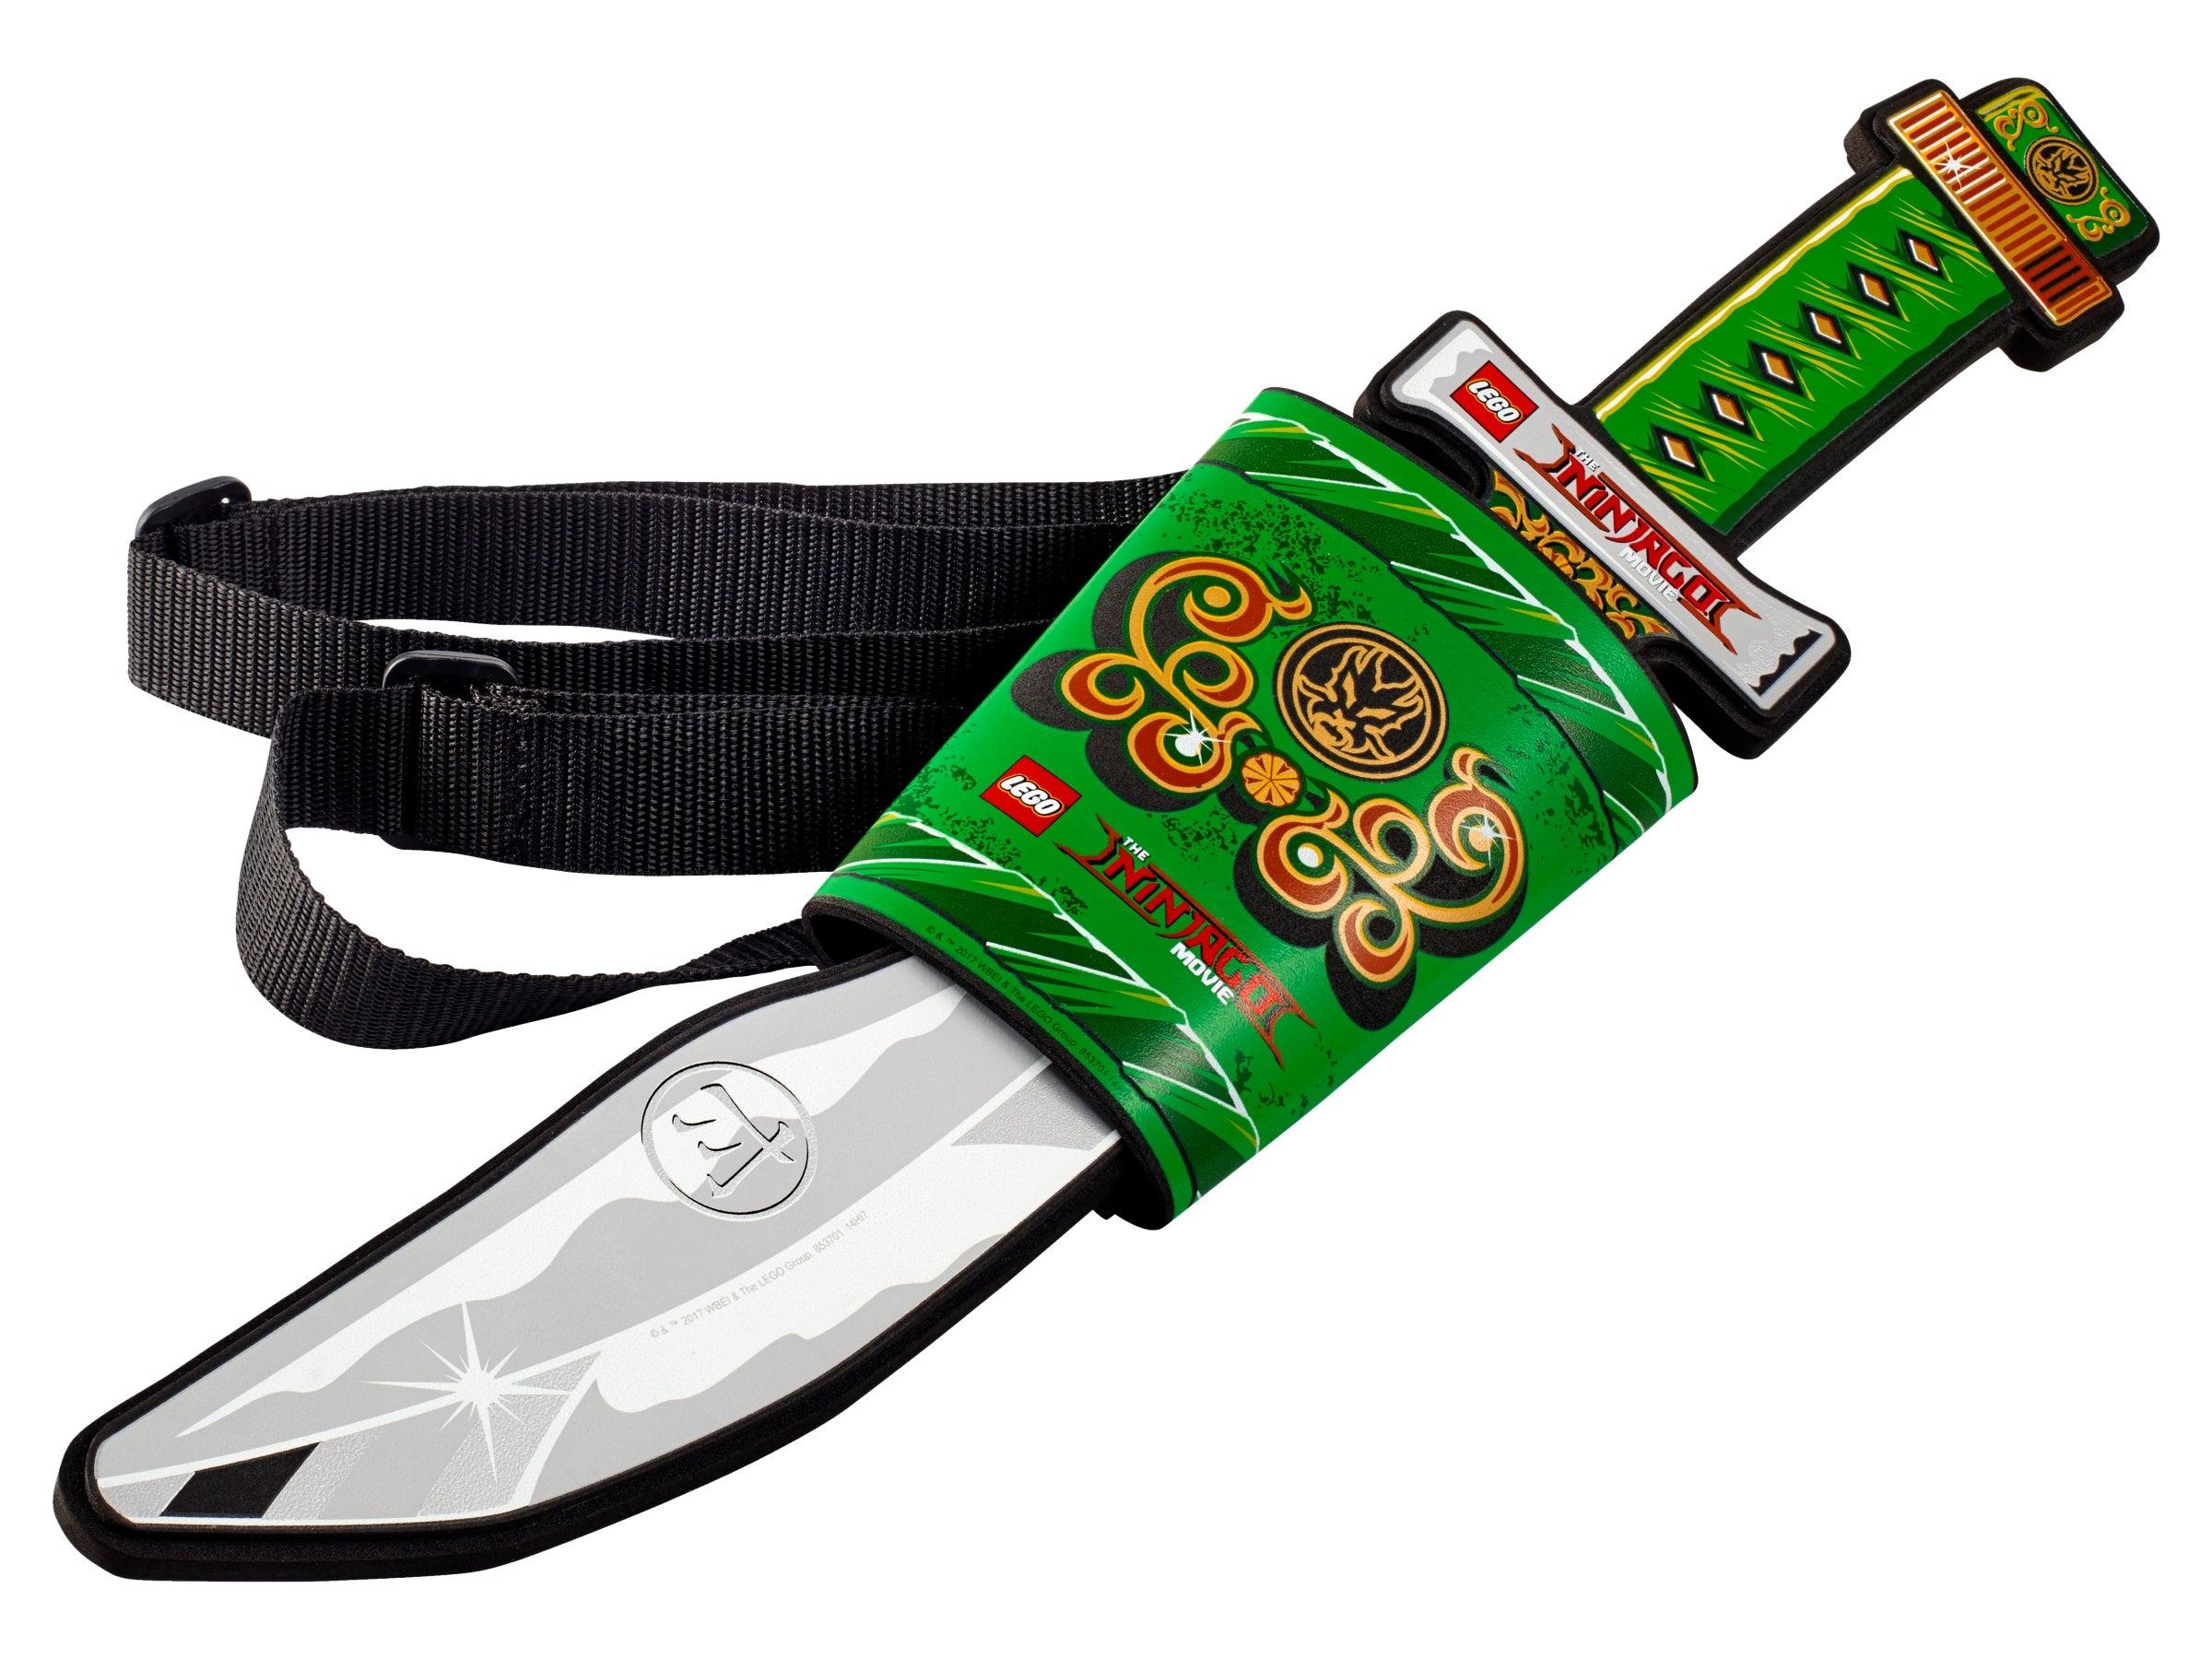 Ninjago Foam Lego 853447  6104745 Sword and Sheath Brand New